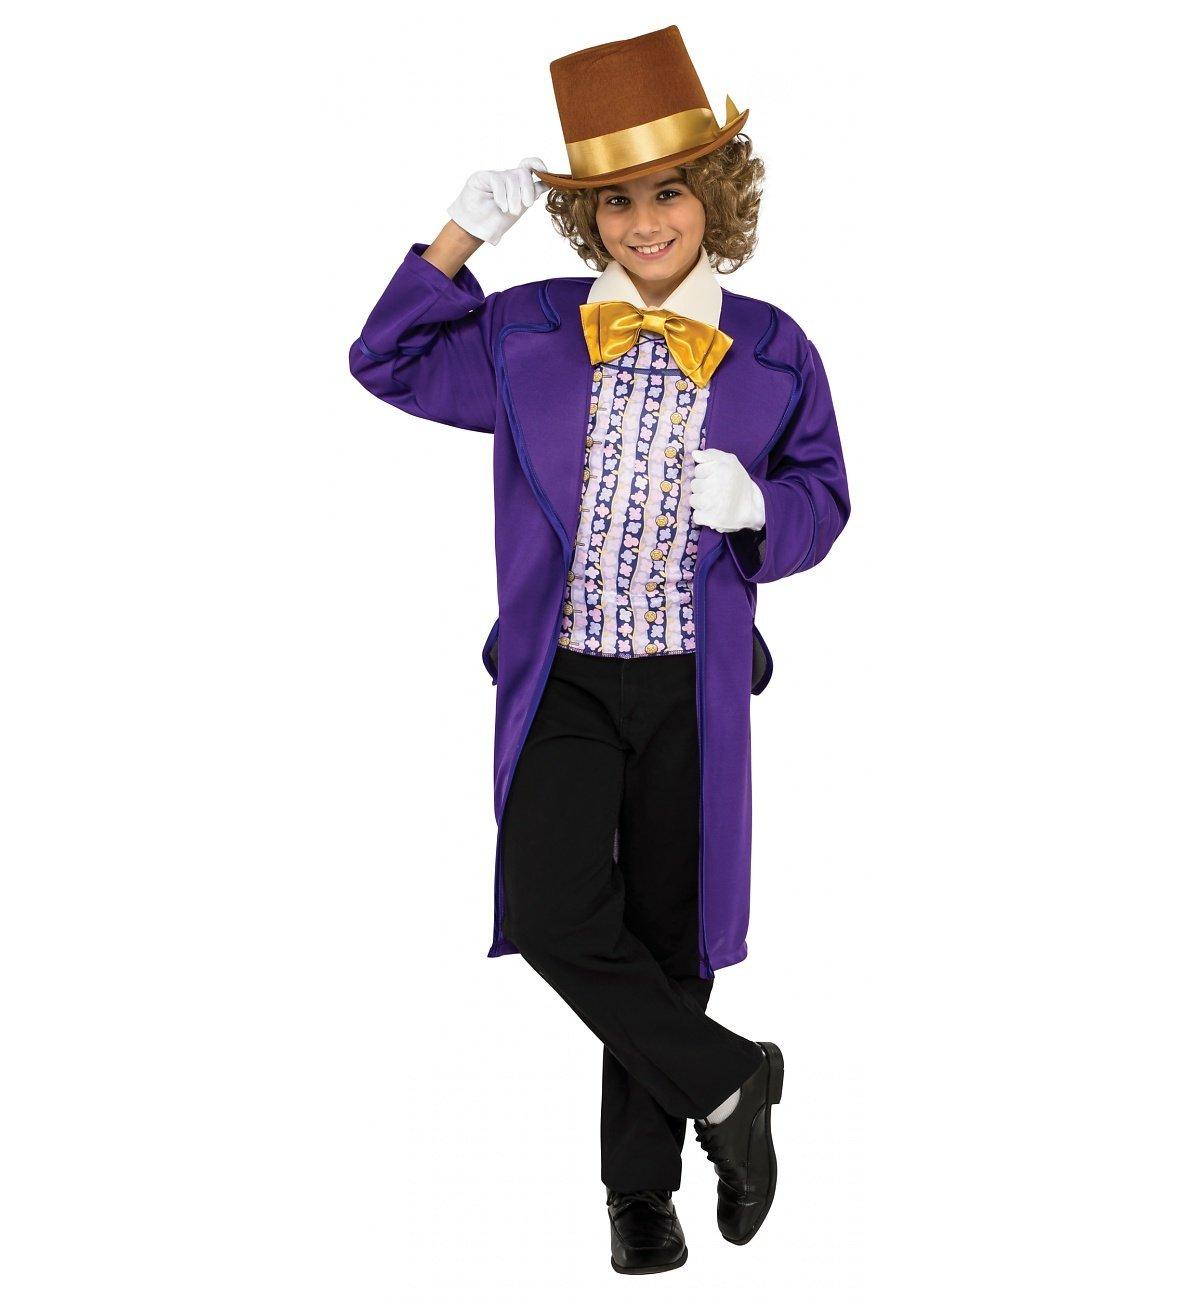 Rubie's Costume Kids Willy Wonka & The Chocolate Factory Willy Wonka Value Costume, Small